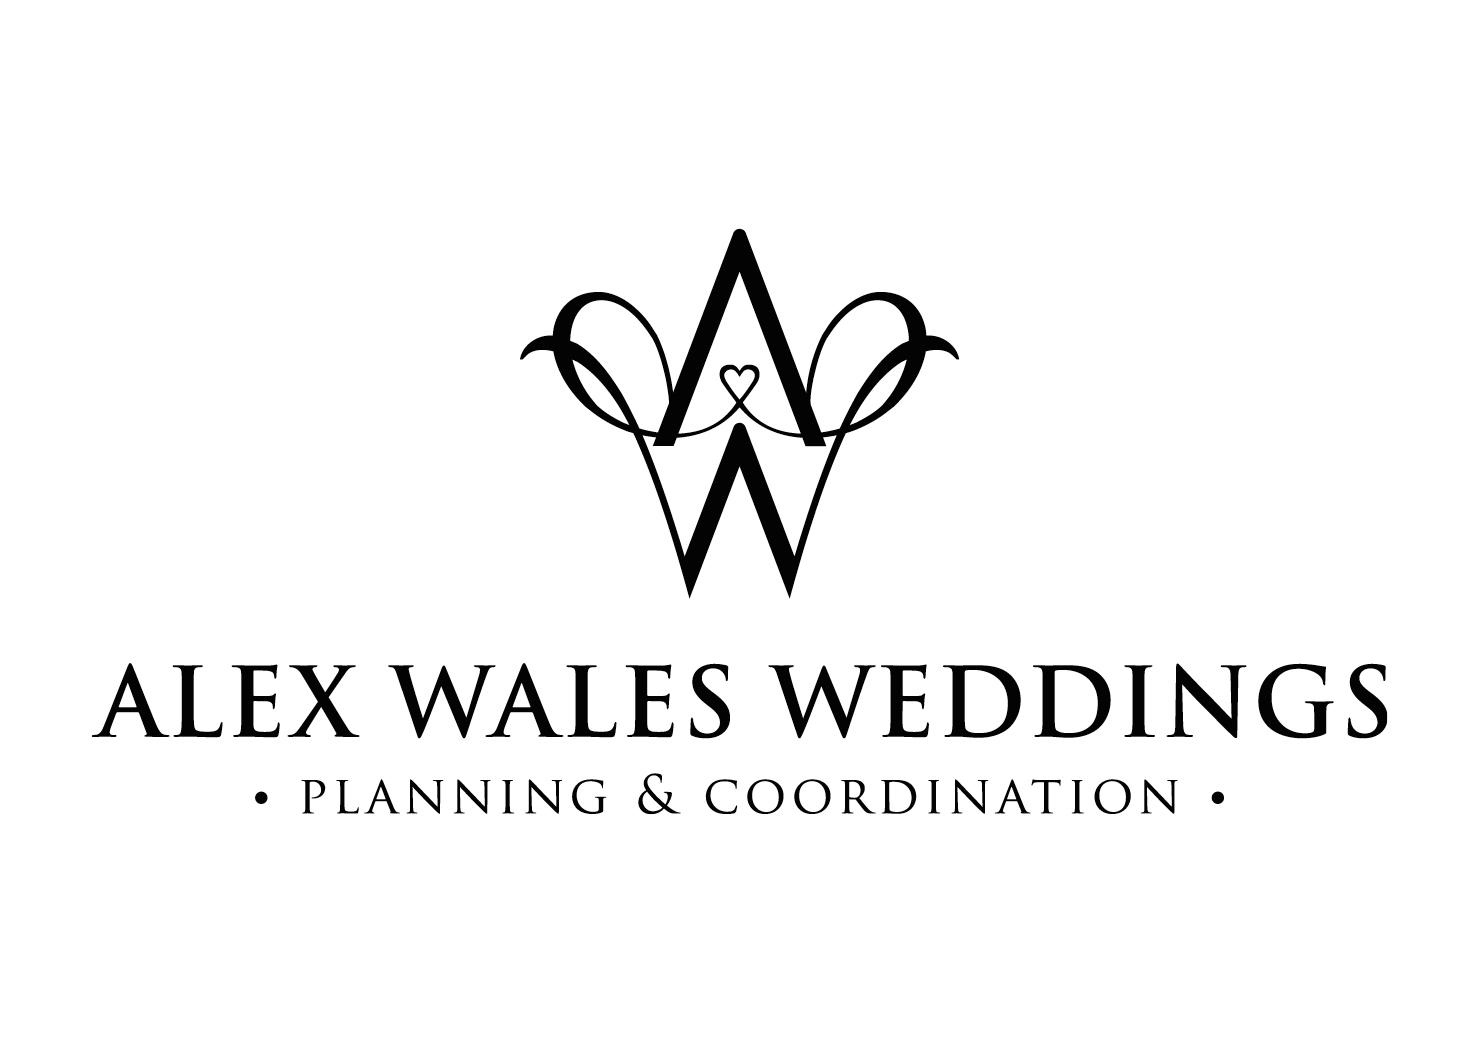 AlexWales_Weddings